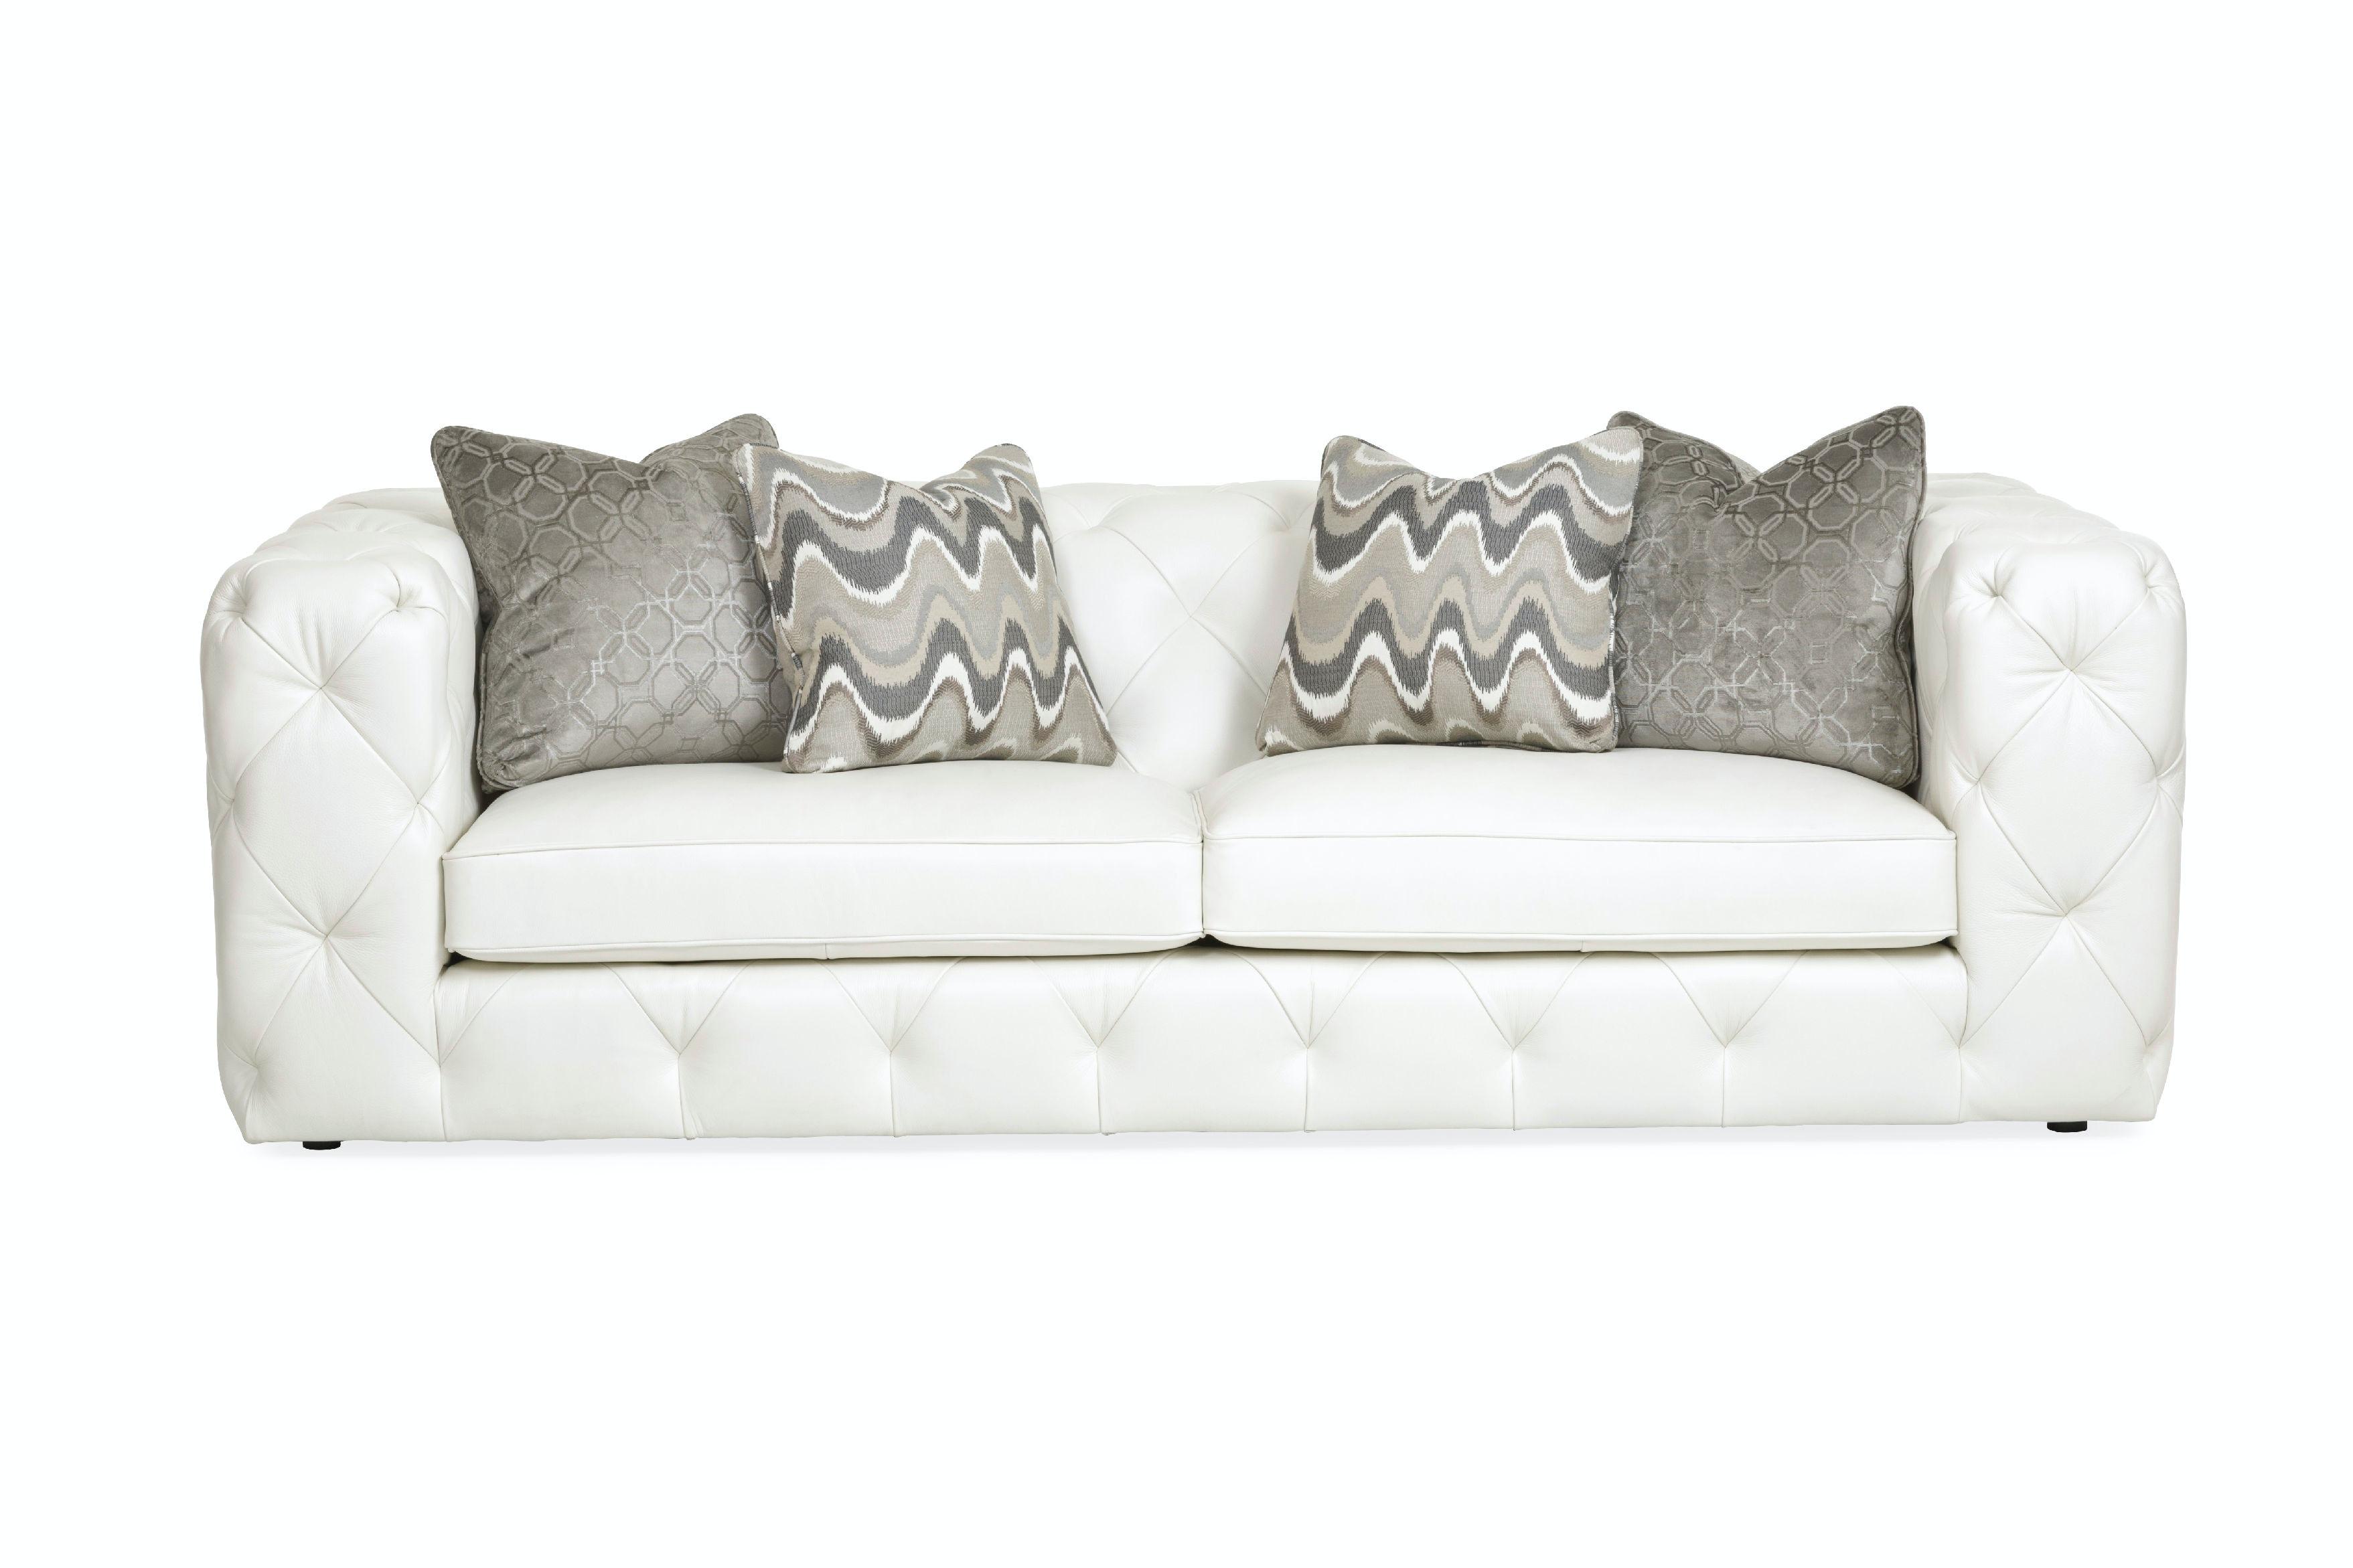 Chelsea Leather Sofa   ARCTIC